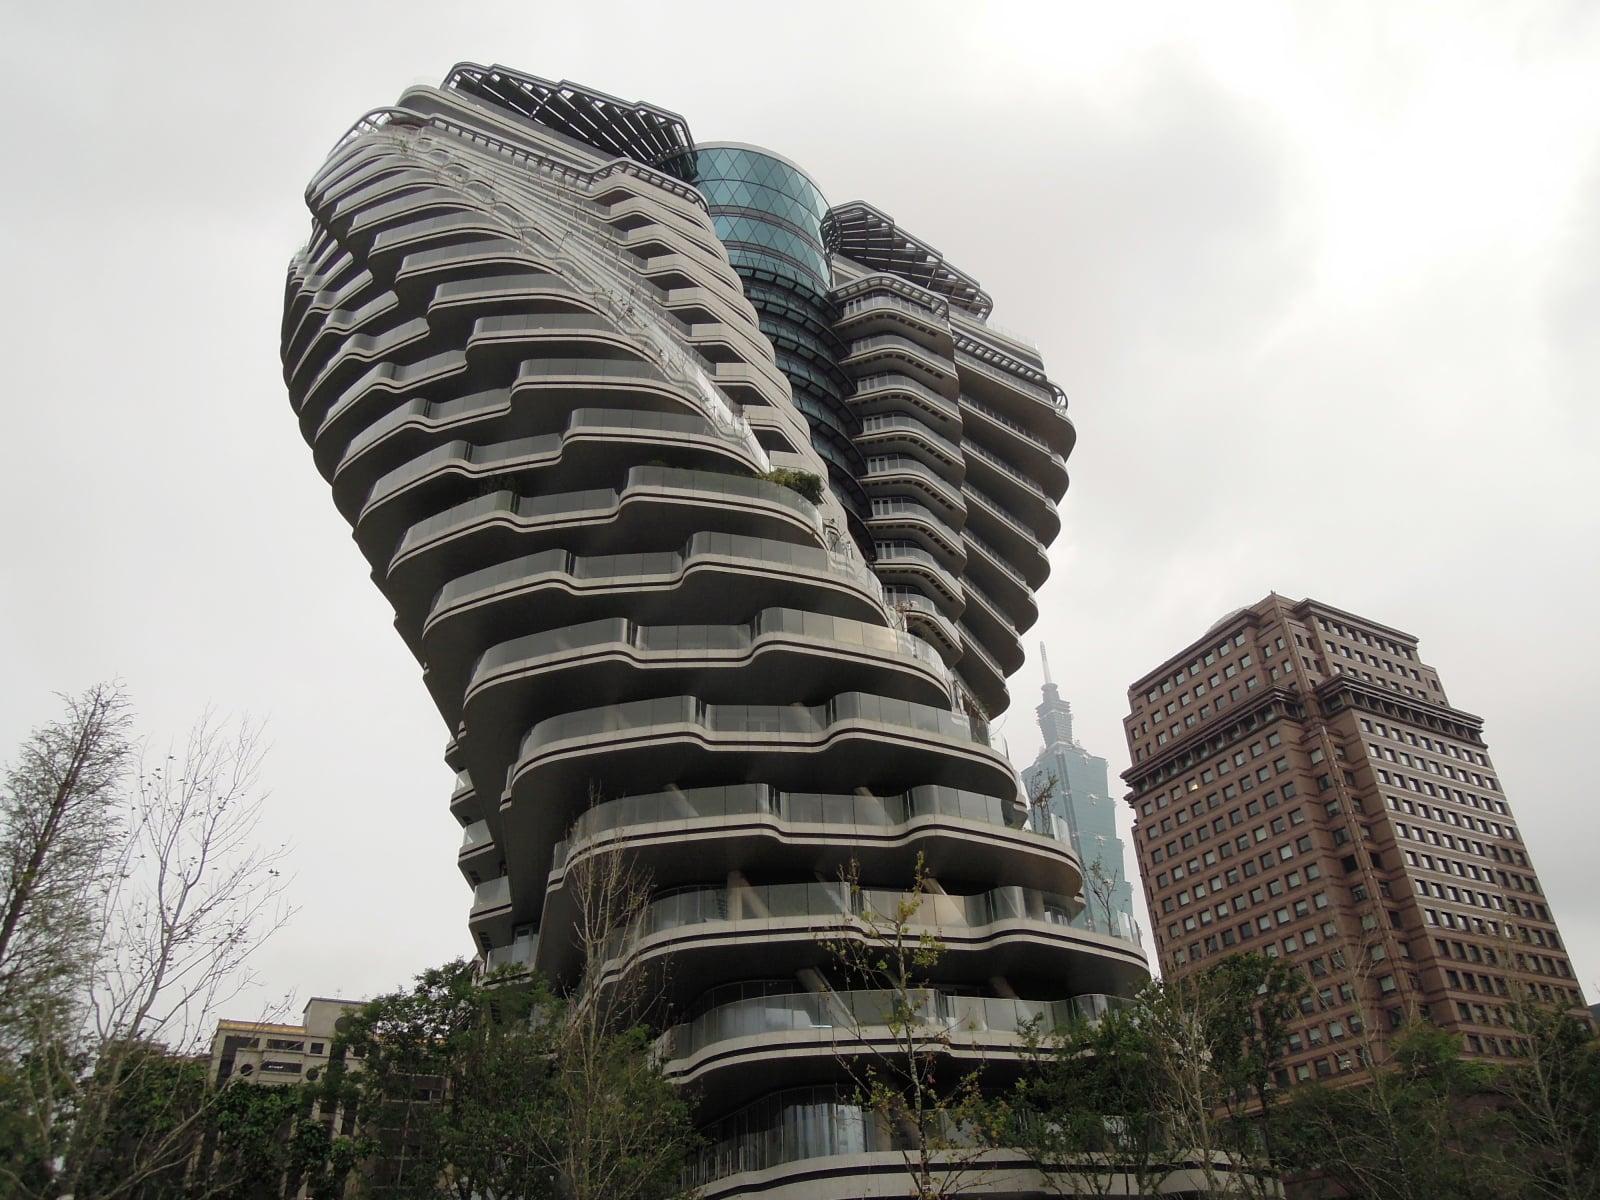 Spiralny budynek na Tajwanie fot/ EPA/HENRY LIN  Dostawca: PAP/EPA.